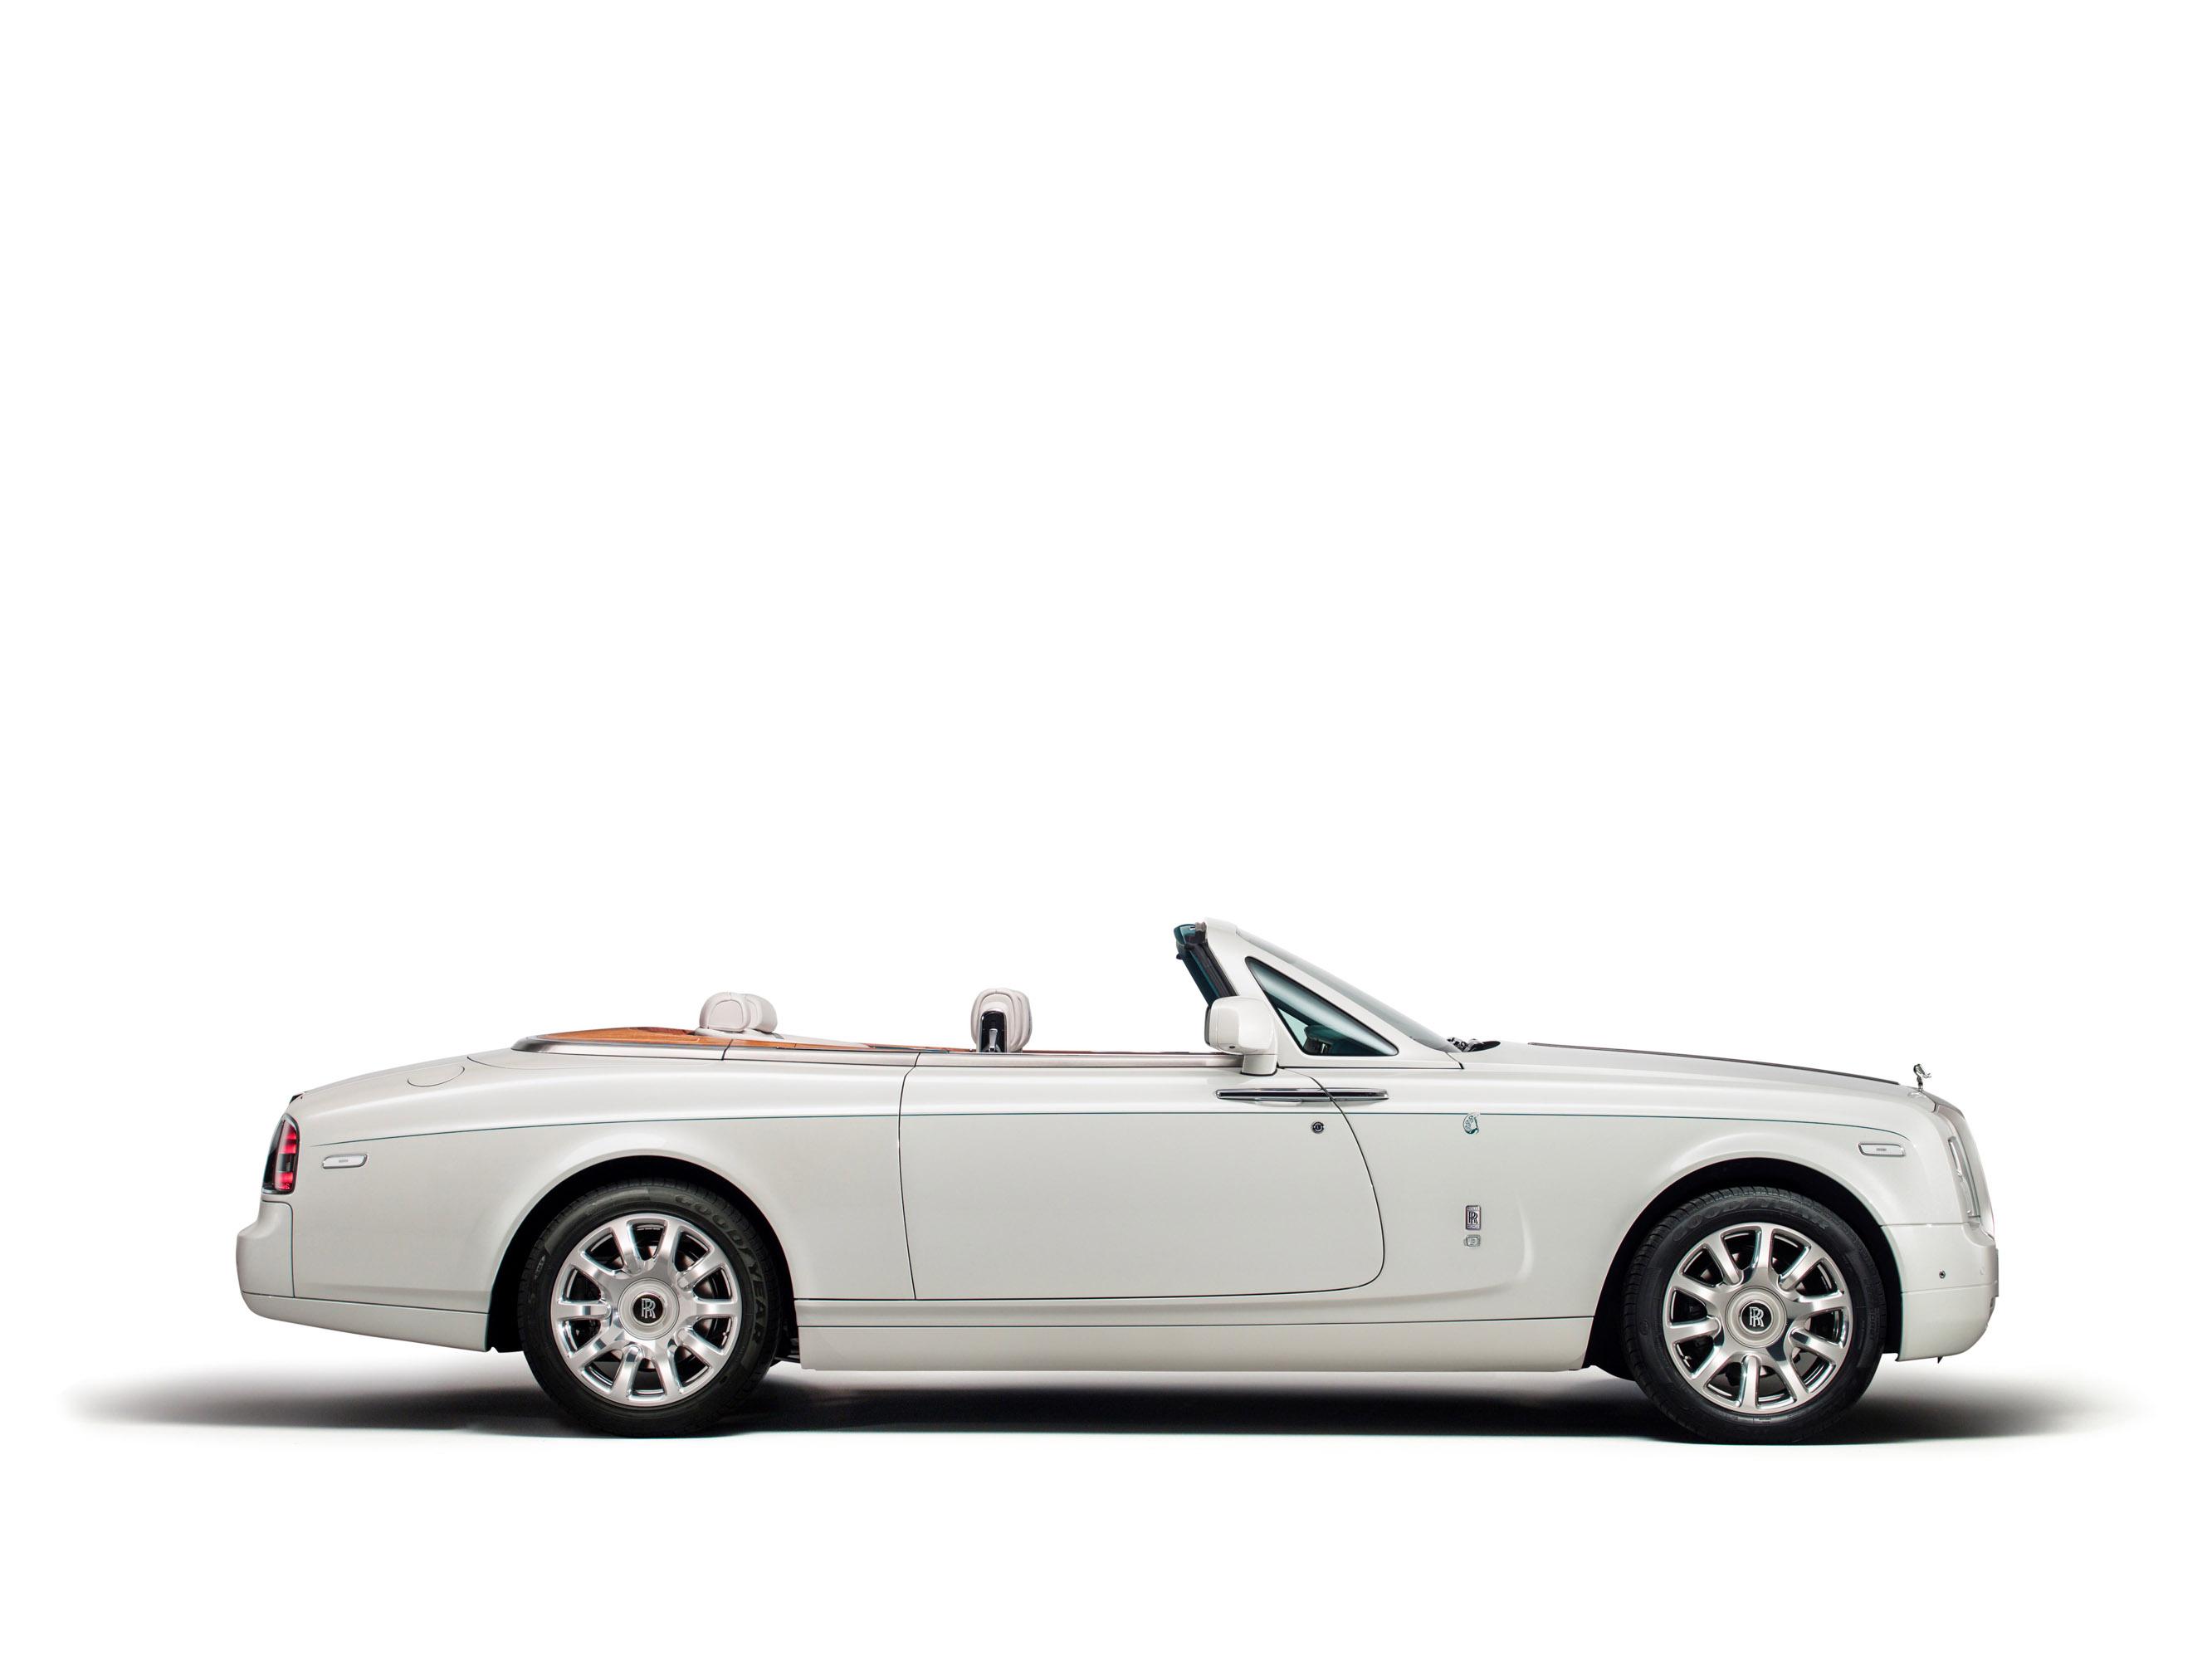 Rolls-Royce Maharaja Phantom Drophead Coupe photo #1